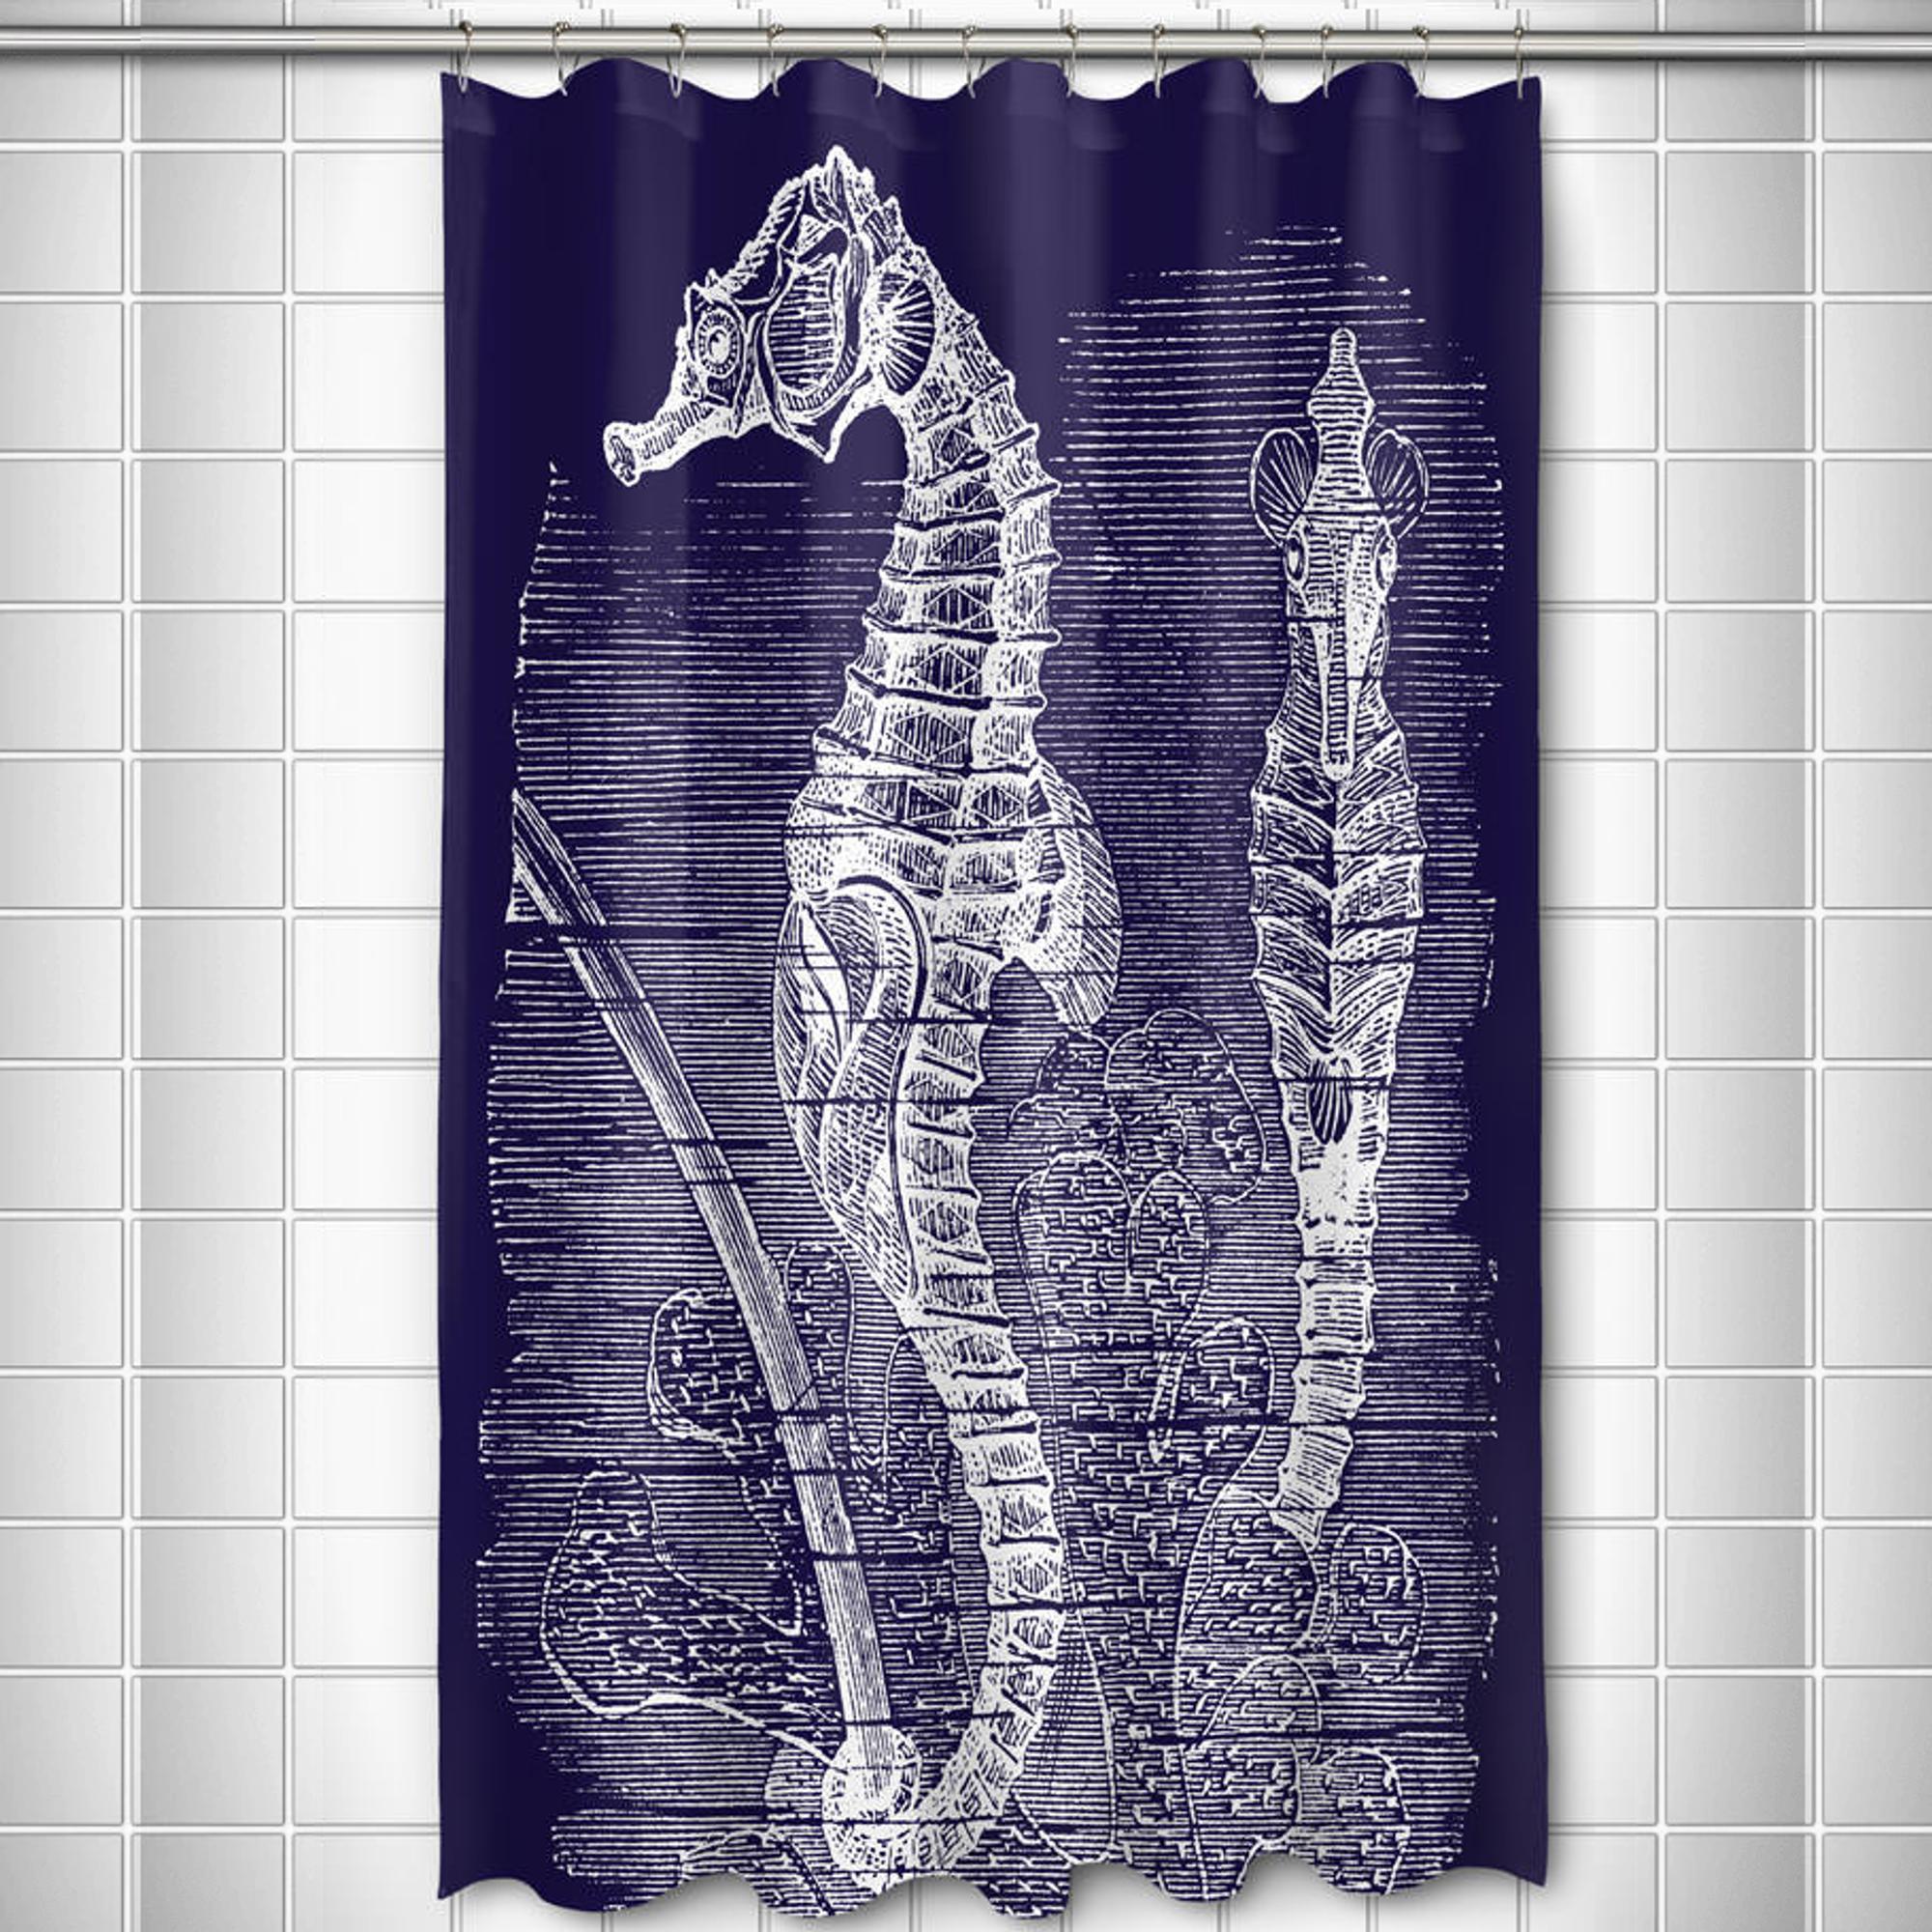 Vintage Navy Seahorse Shower Curtain